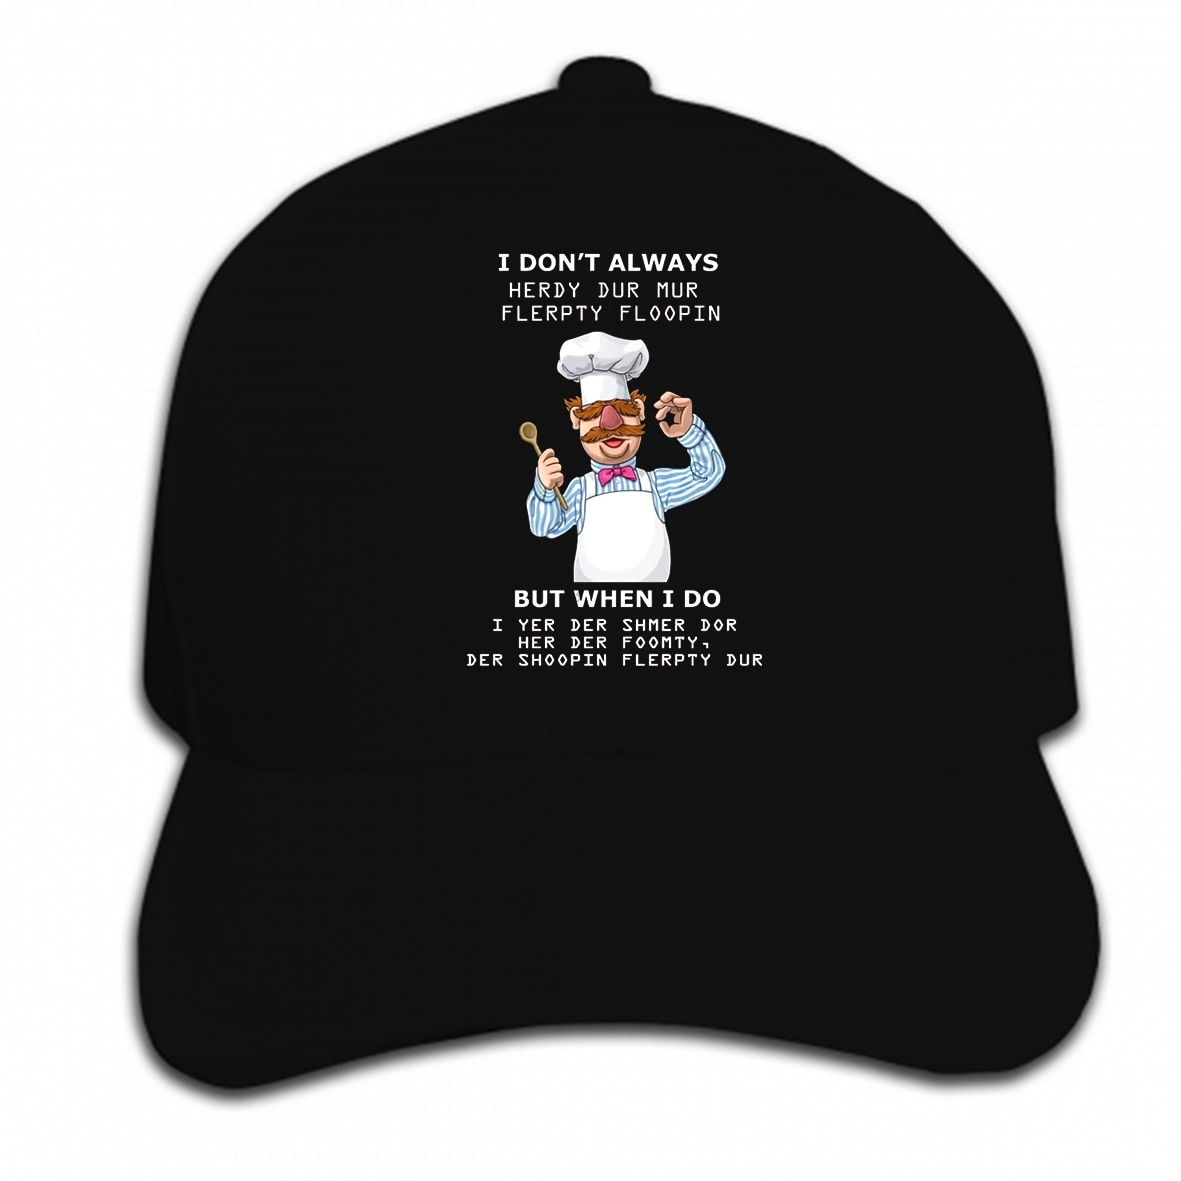 Gorra de béisbol personalizada estampada para hombre, divertida gorra de béisbol con frase de Chef sueco para mujer